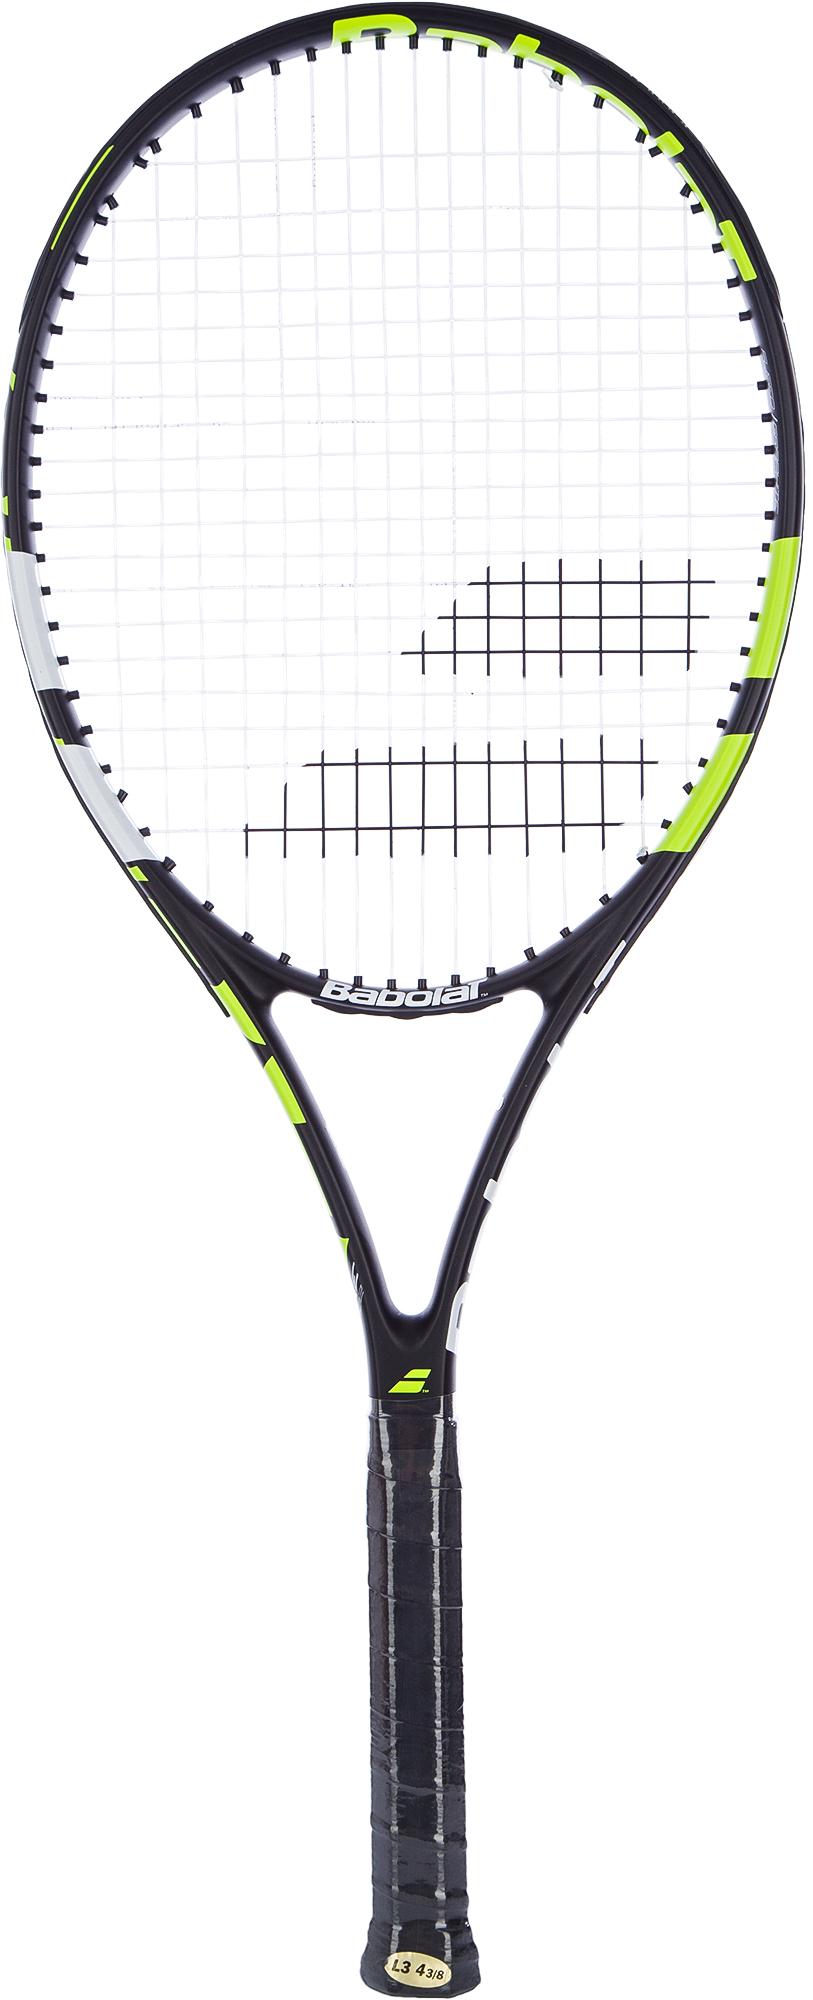 Babolat Ракетка для большого тенниса Babolat EVOKE 102 27 babolat ракетка для большого тенниса детская babolat ballfighter 23